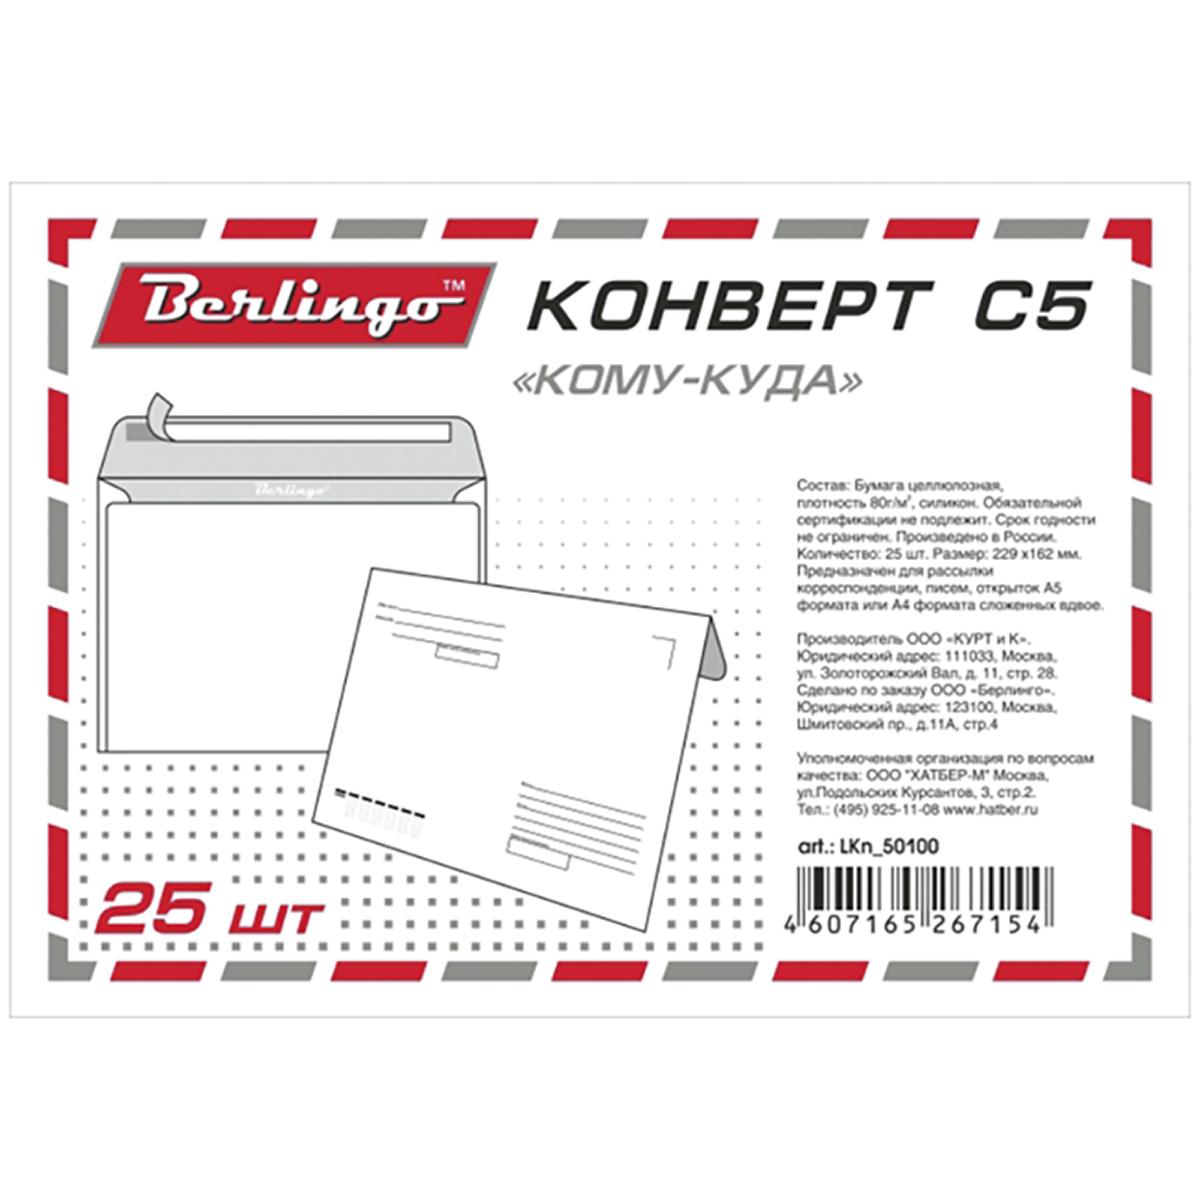 Berlingo Конверт C5 с подсказом 25 шт конверт noname 817995 без окна 110 х 220 мм 817995